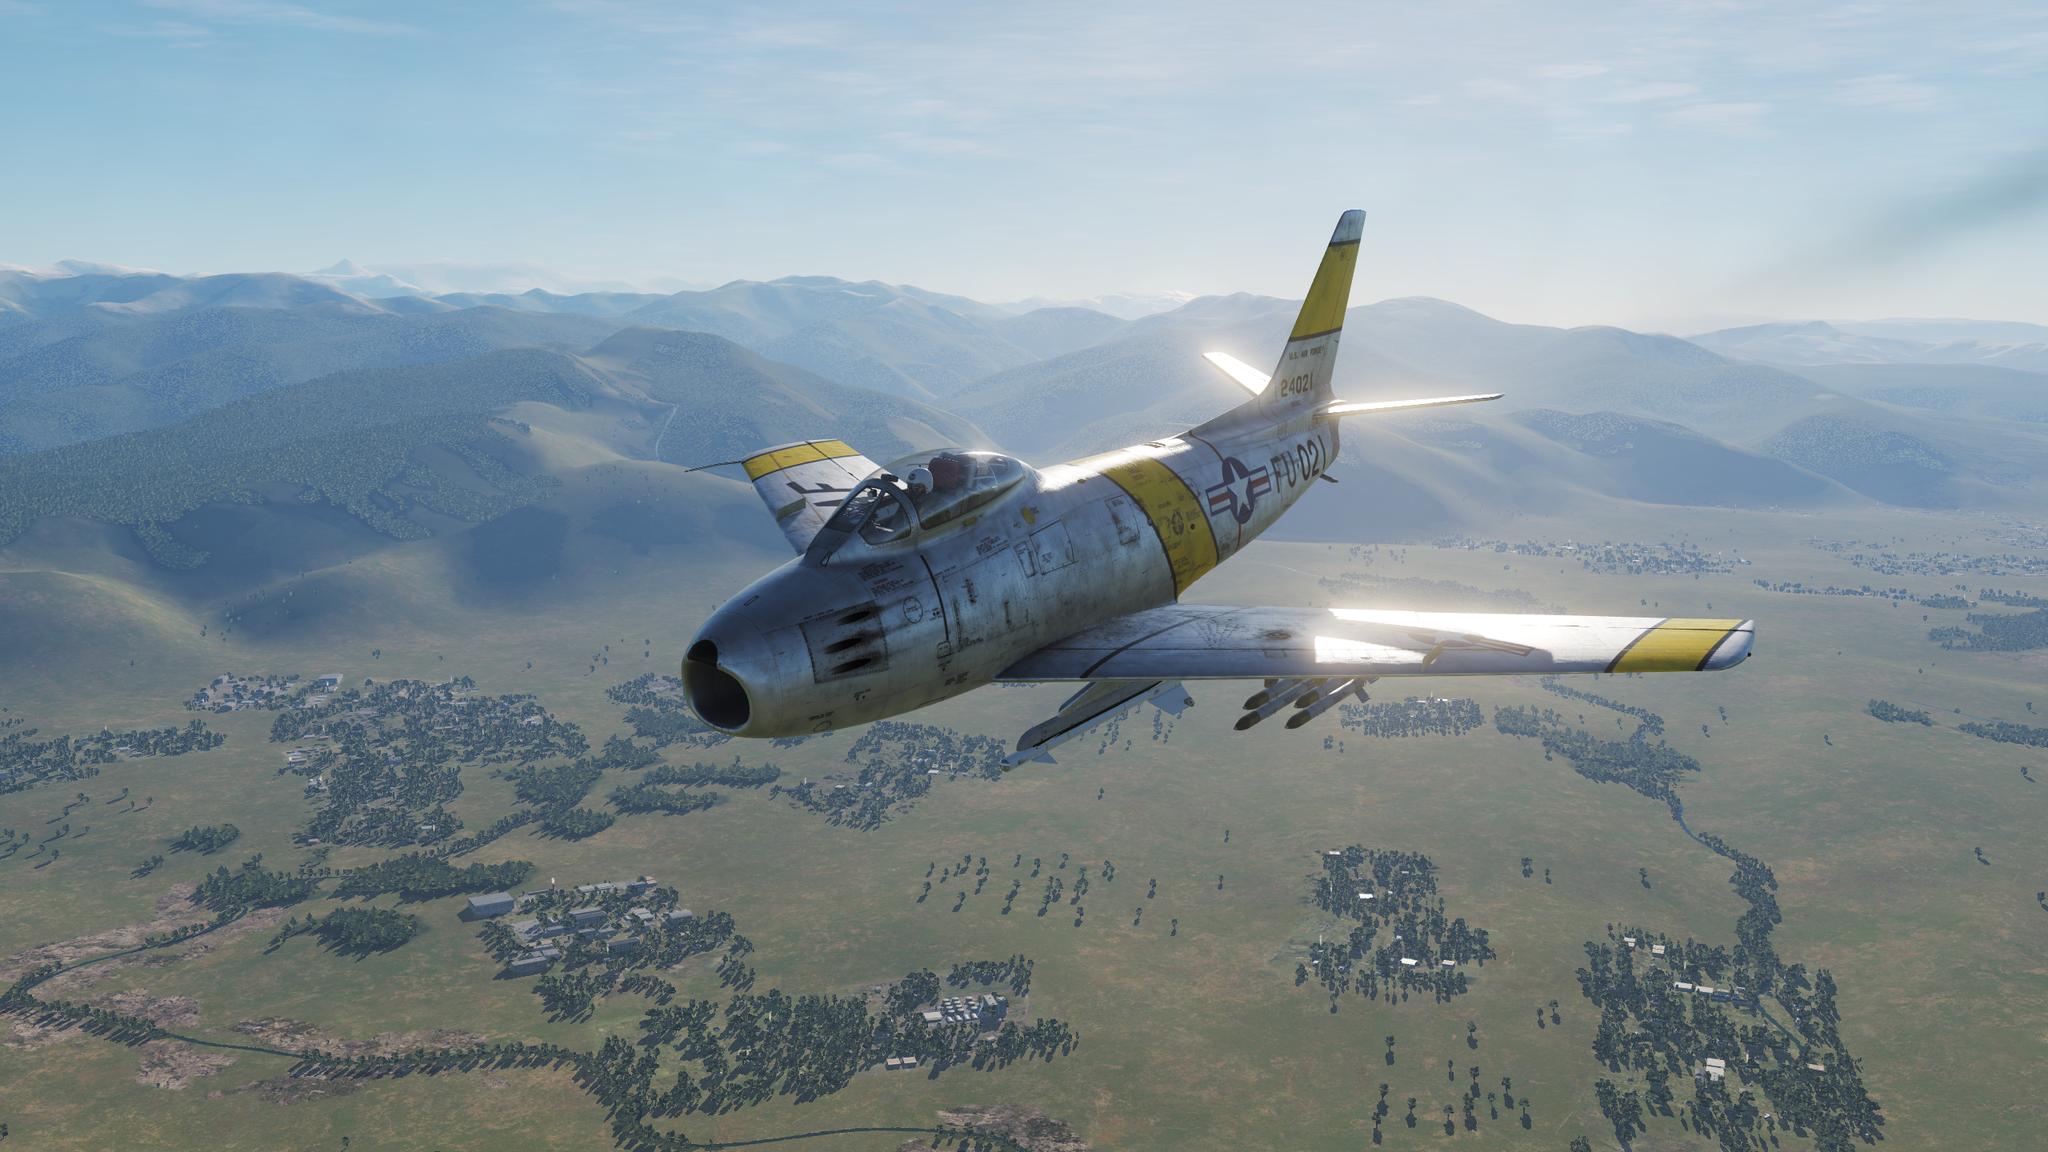 Обои F-86 Sabre, Самолёт. Авиация foto 2